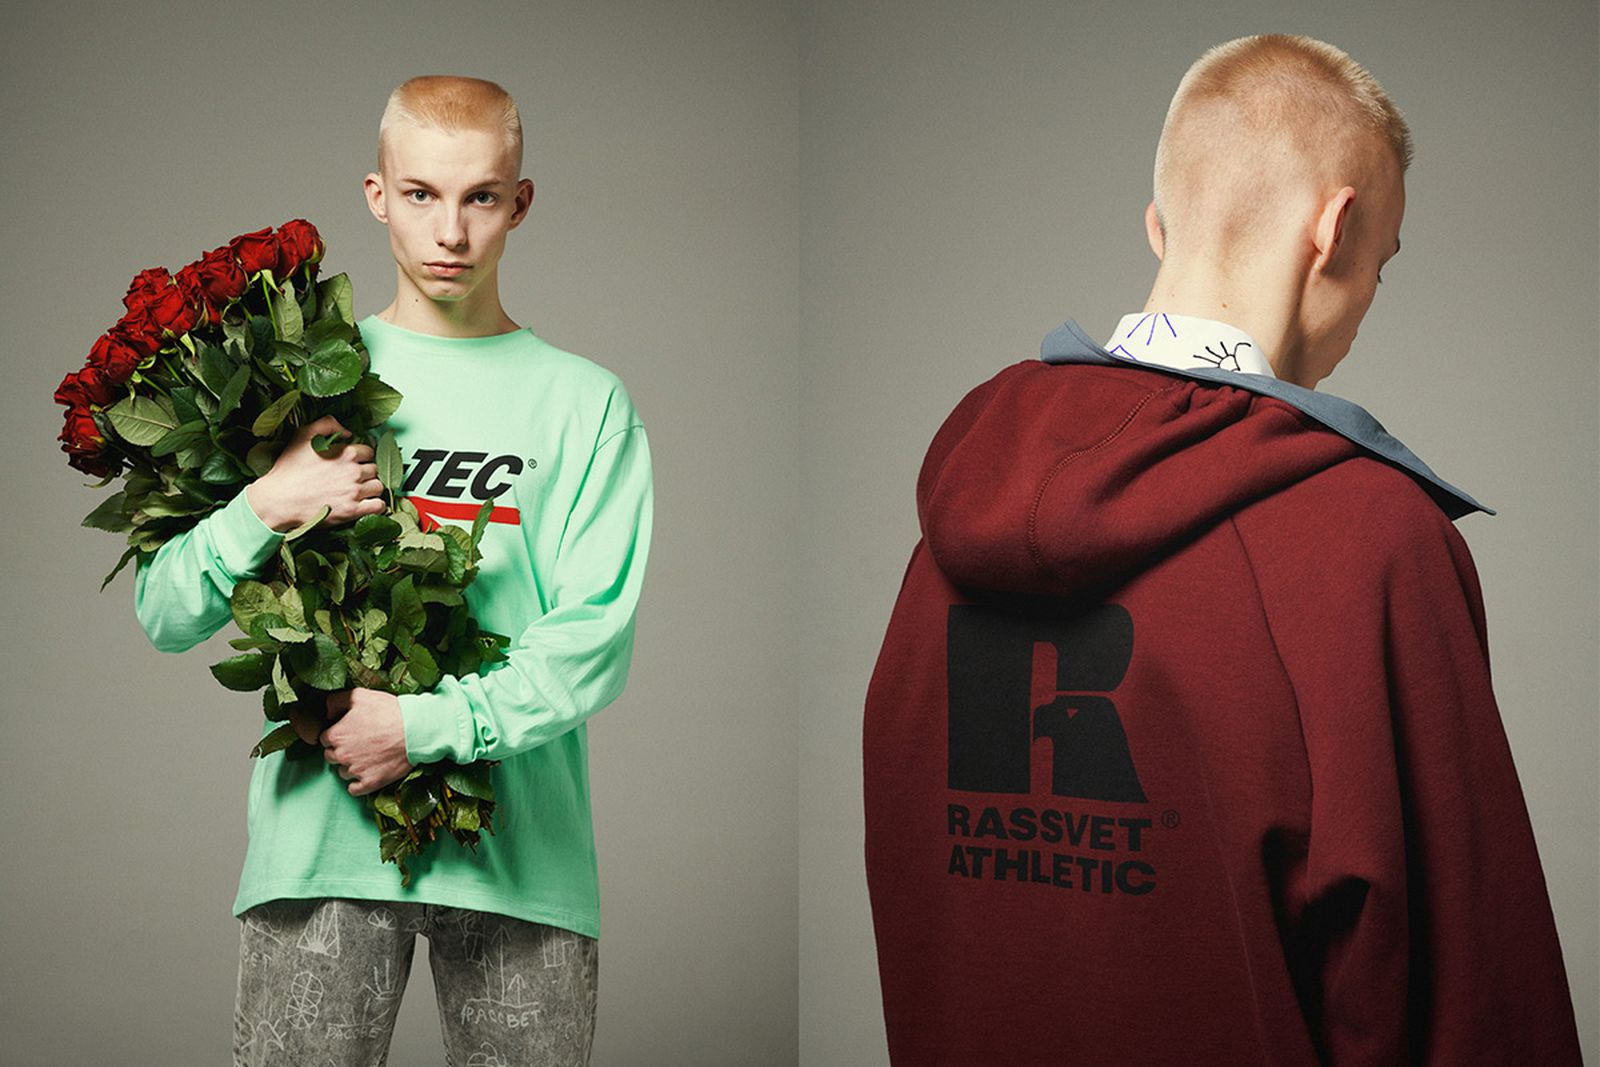 paccbet hi tec sportswear capsule collection Gosha Rubchinskiy Rassvet Russell Athletic